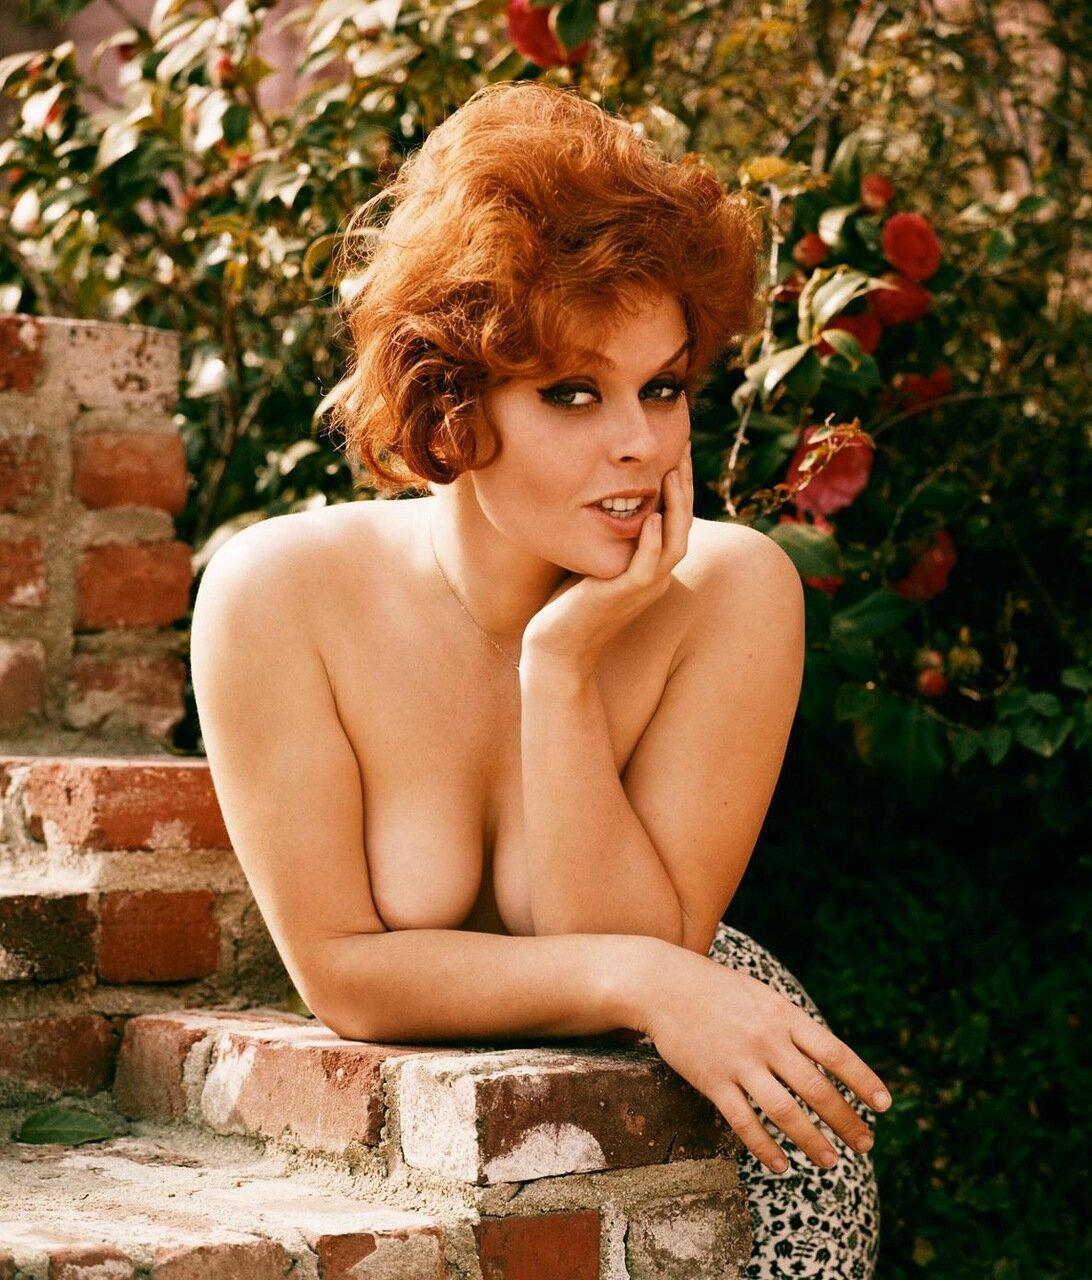 Ginger harrison nude playboy